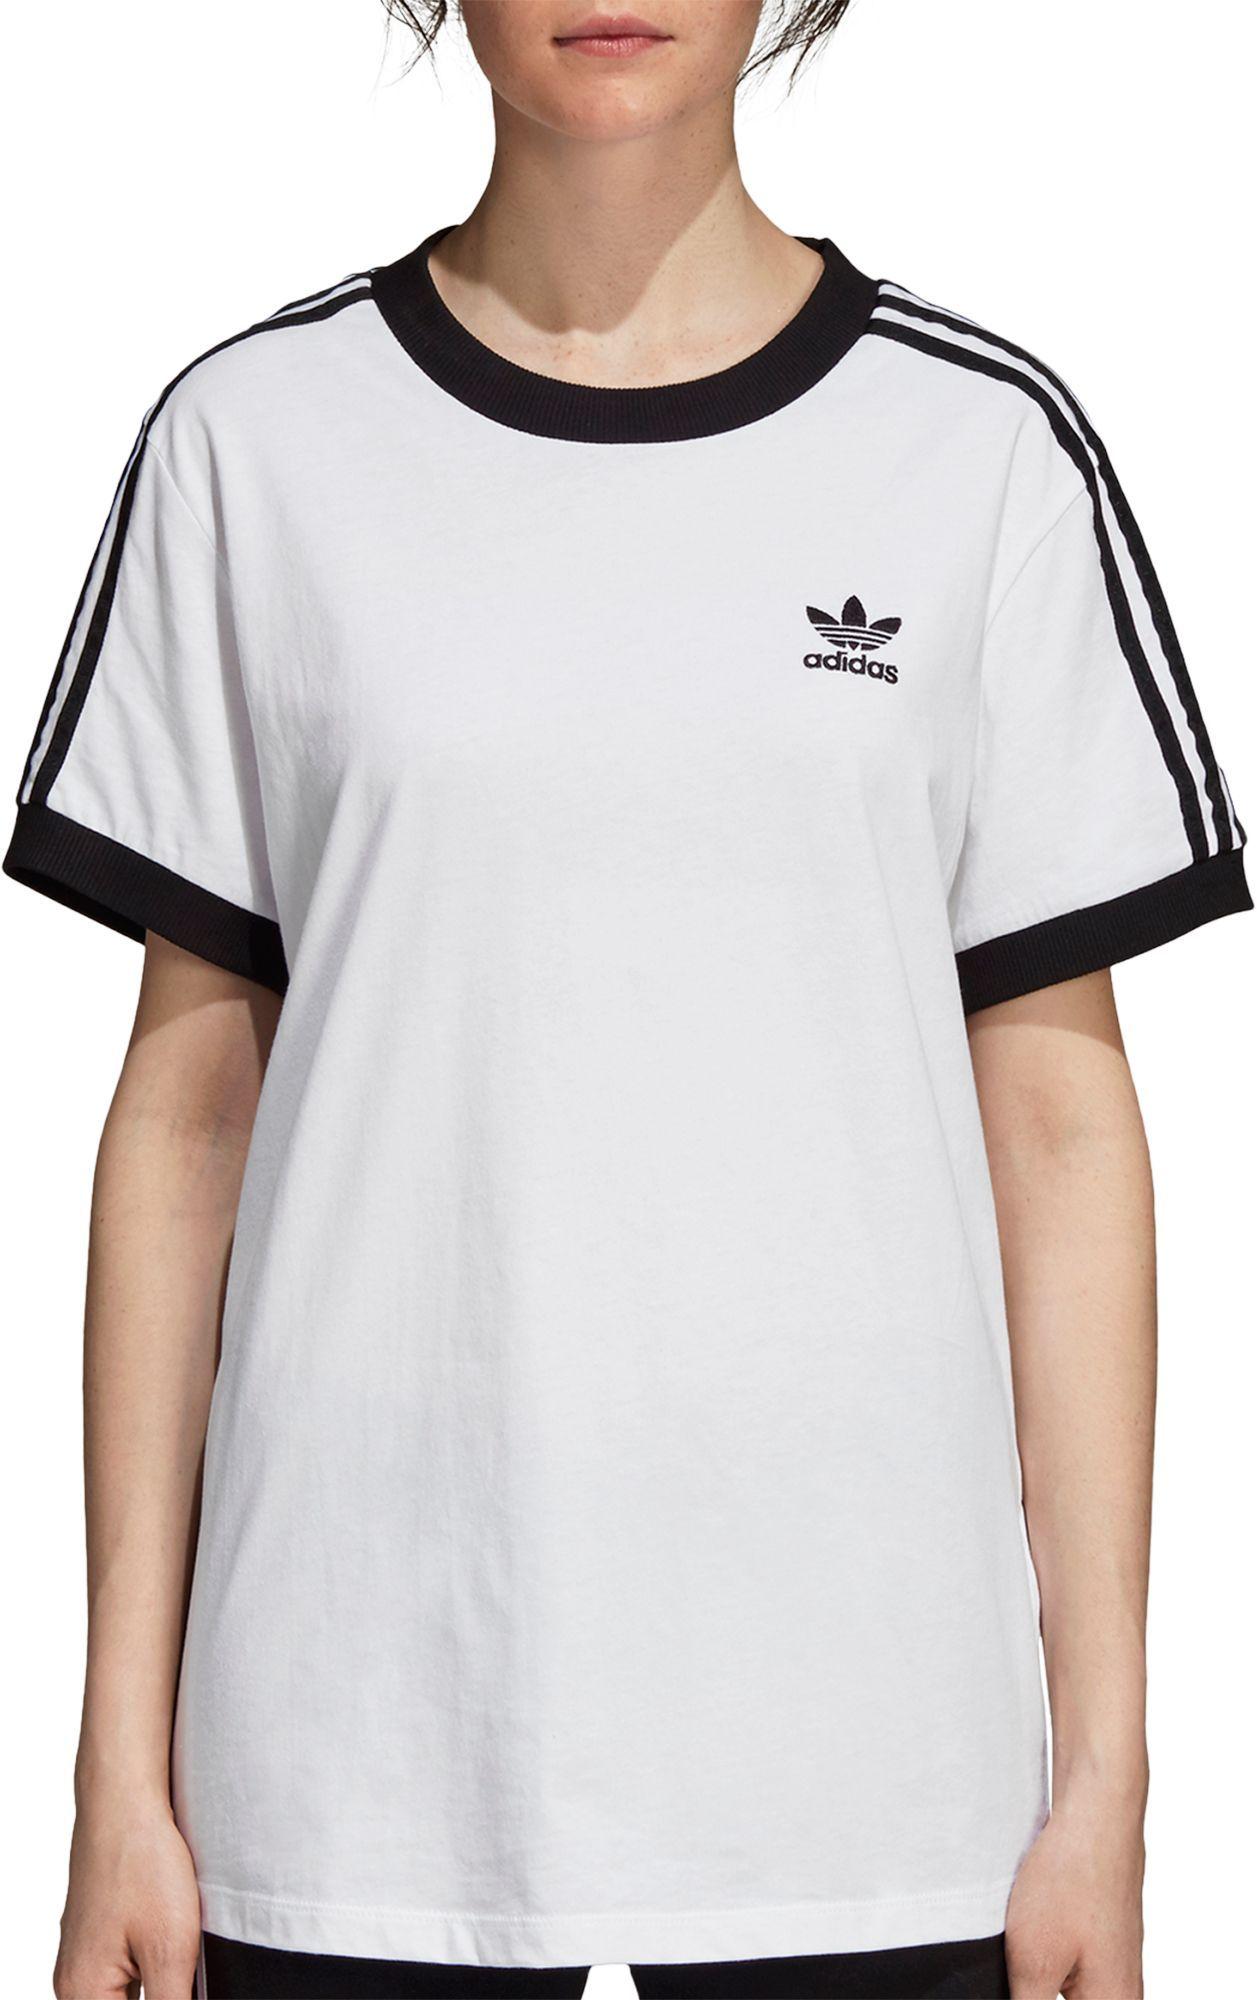 adidas s size t shirt